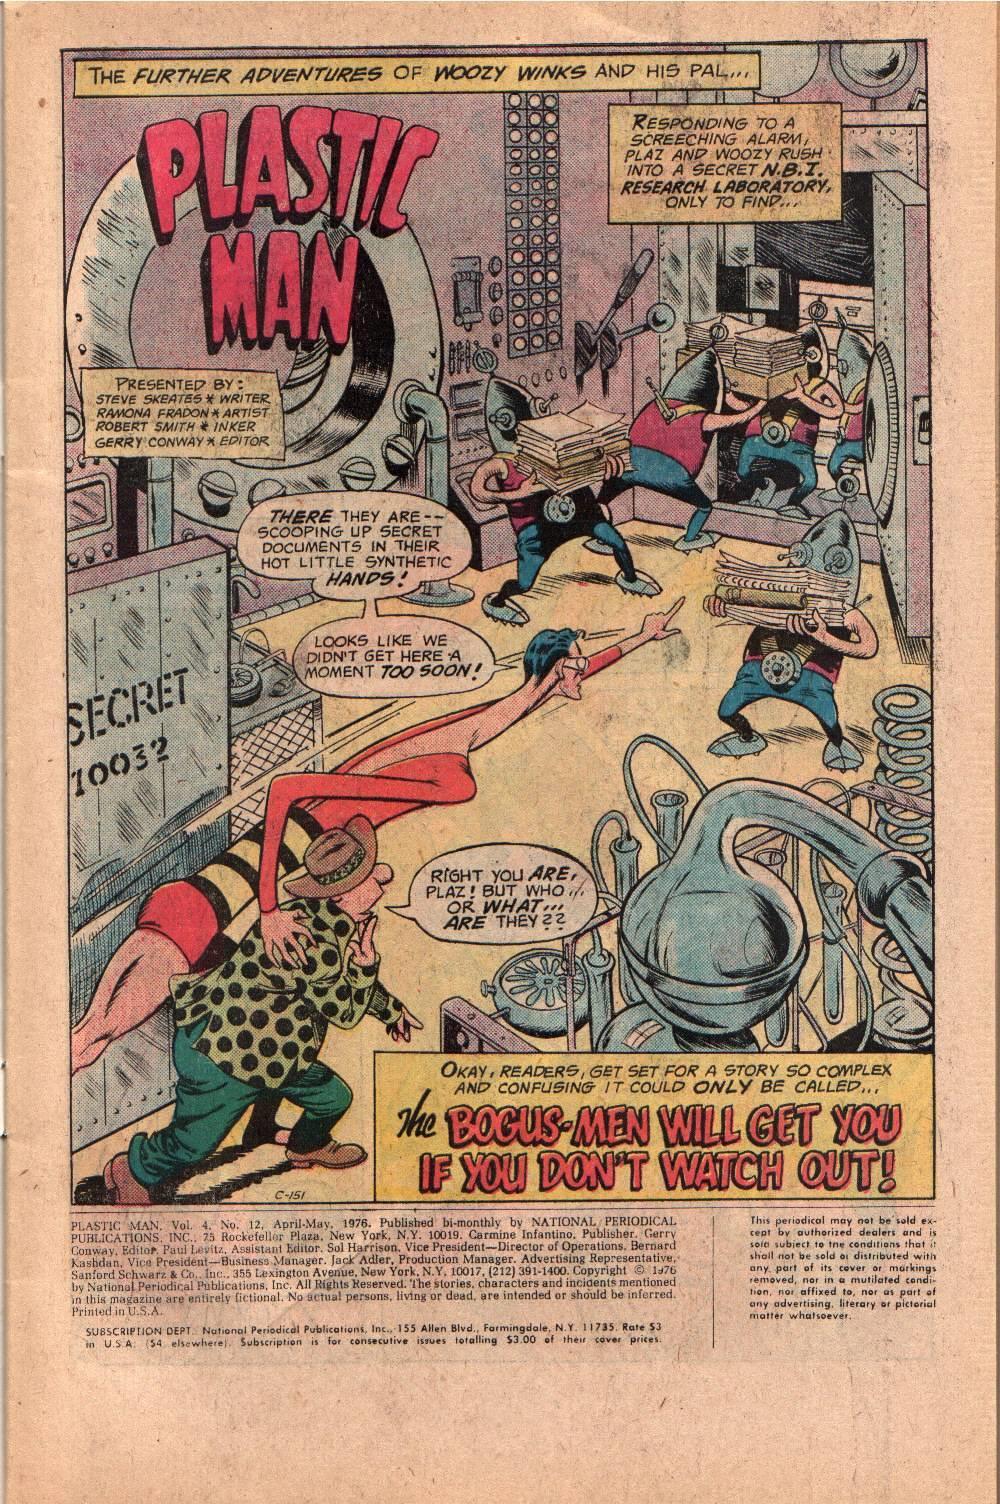 Plastic Man (1966) #12 pg1, penciled by Ramona Fradon & inked by Bob Smith.